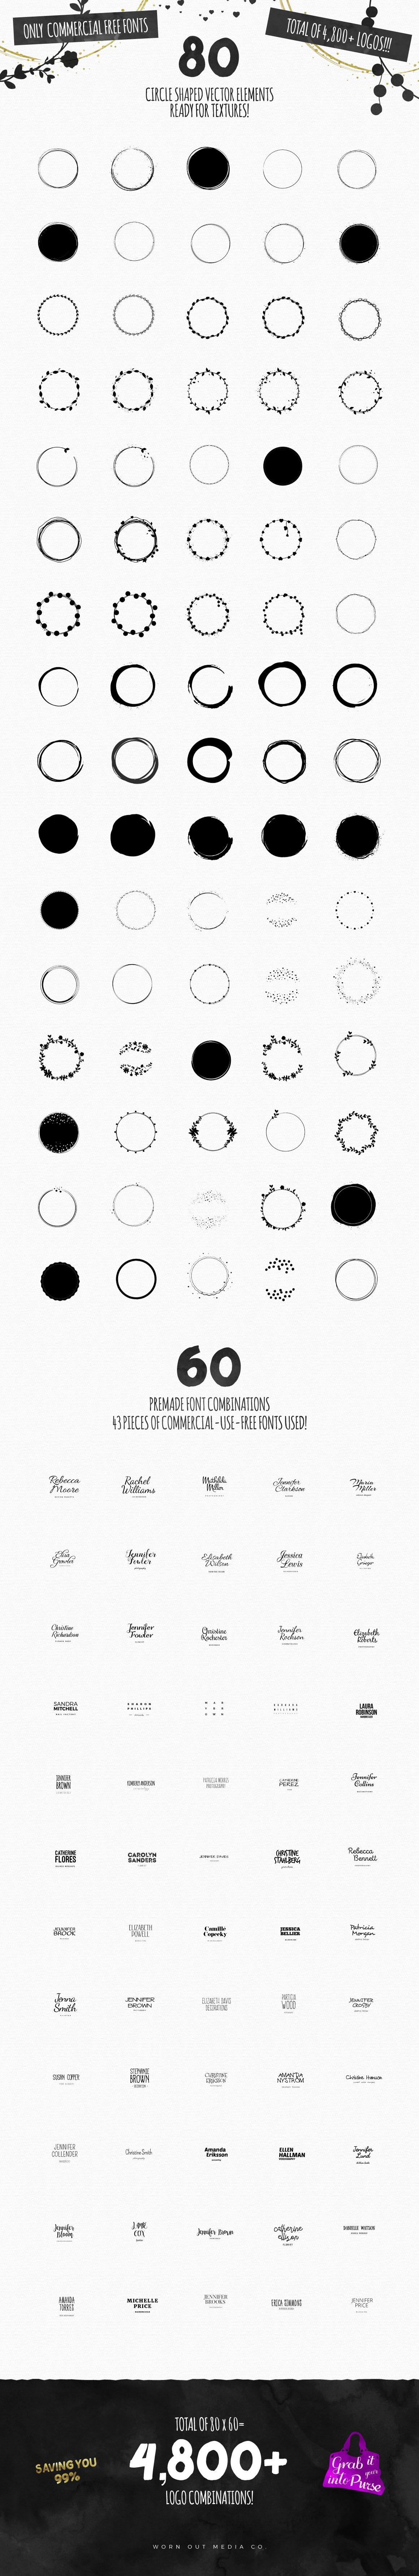 feminine-logo-templates-long-preview-2-o